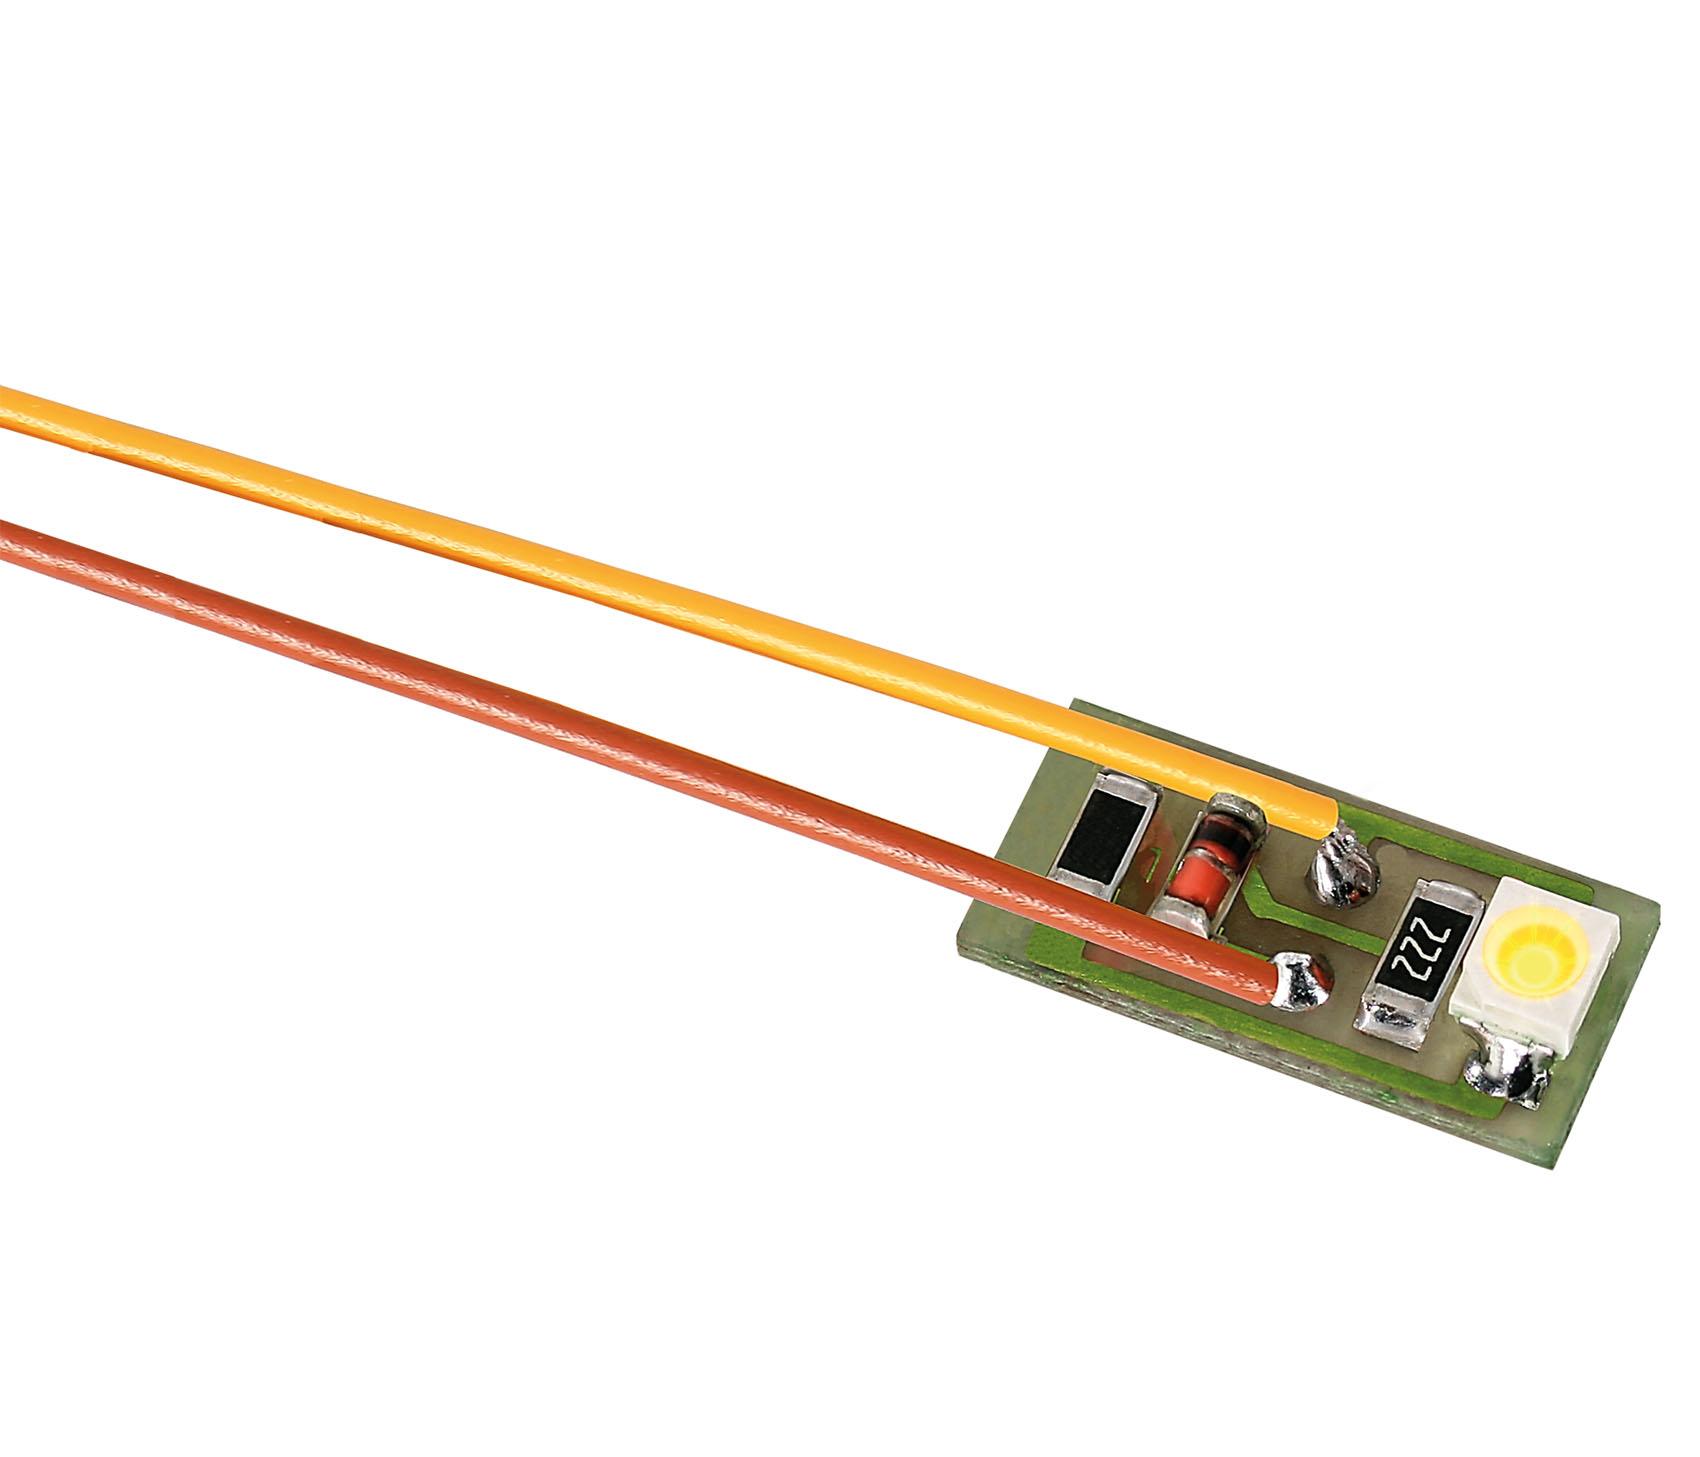 Viessmann 6007 Hausbeleuchtung mit 1 LED gelb, 10 Stück